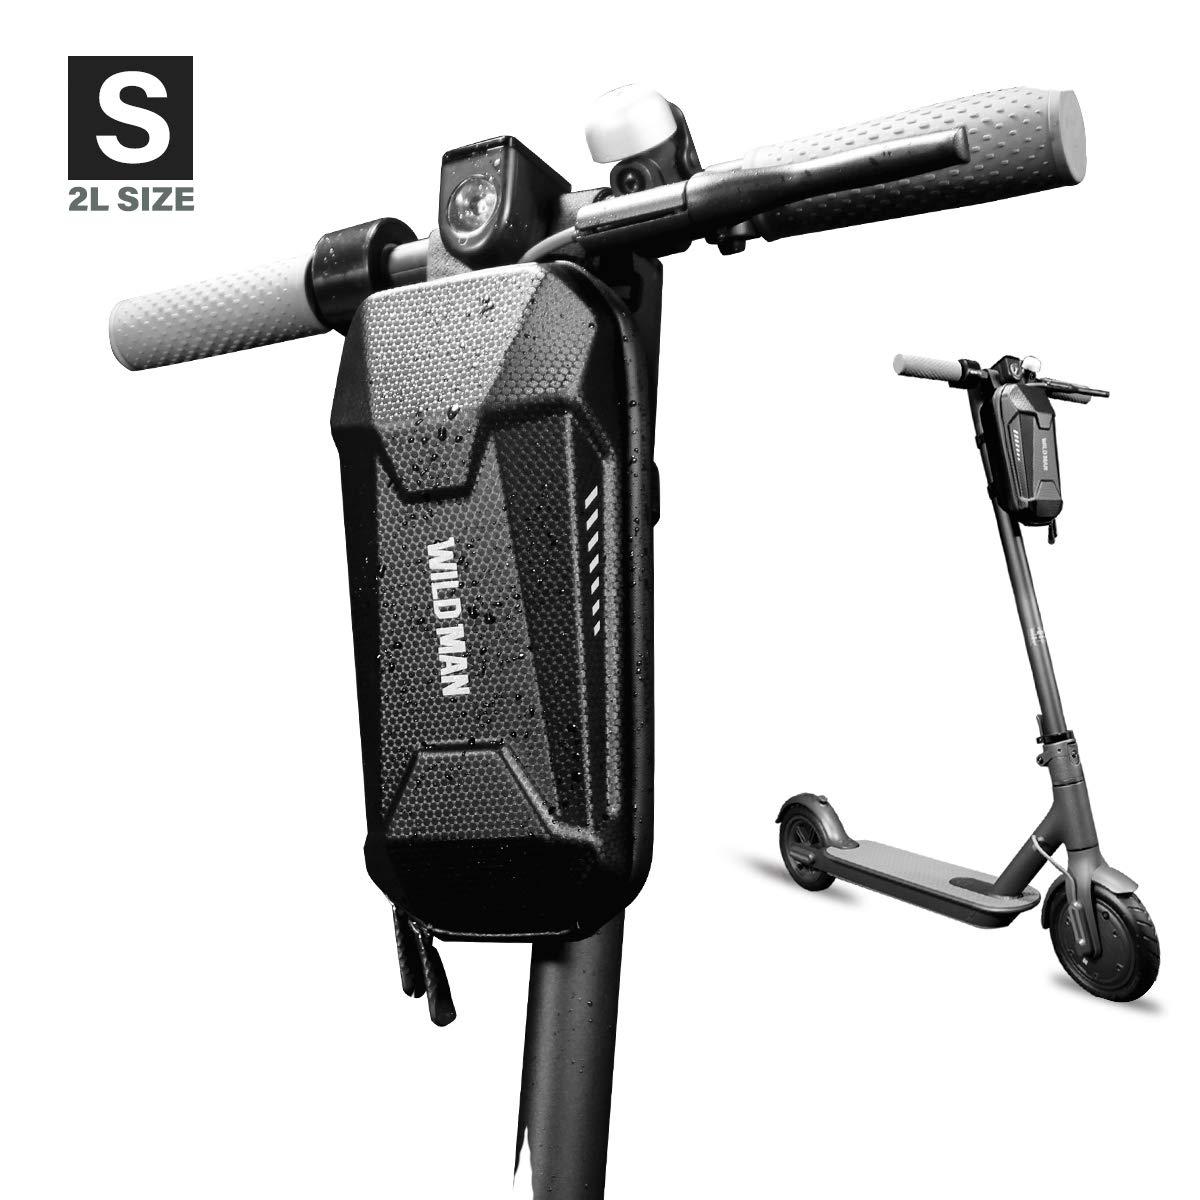 Amazon.com: Seway Scooter Storage Bag, Front Hanging Bag for ...